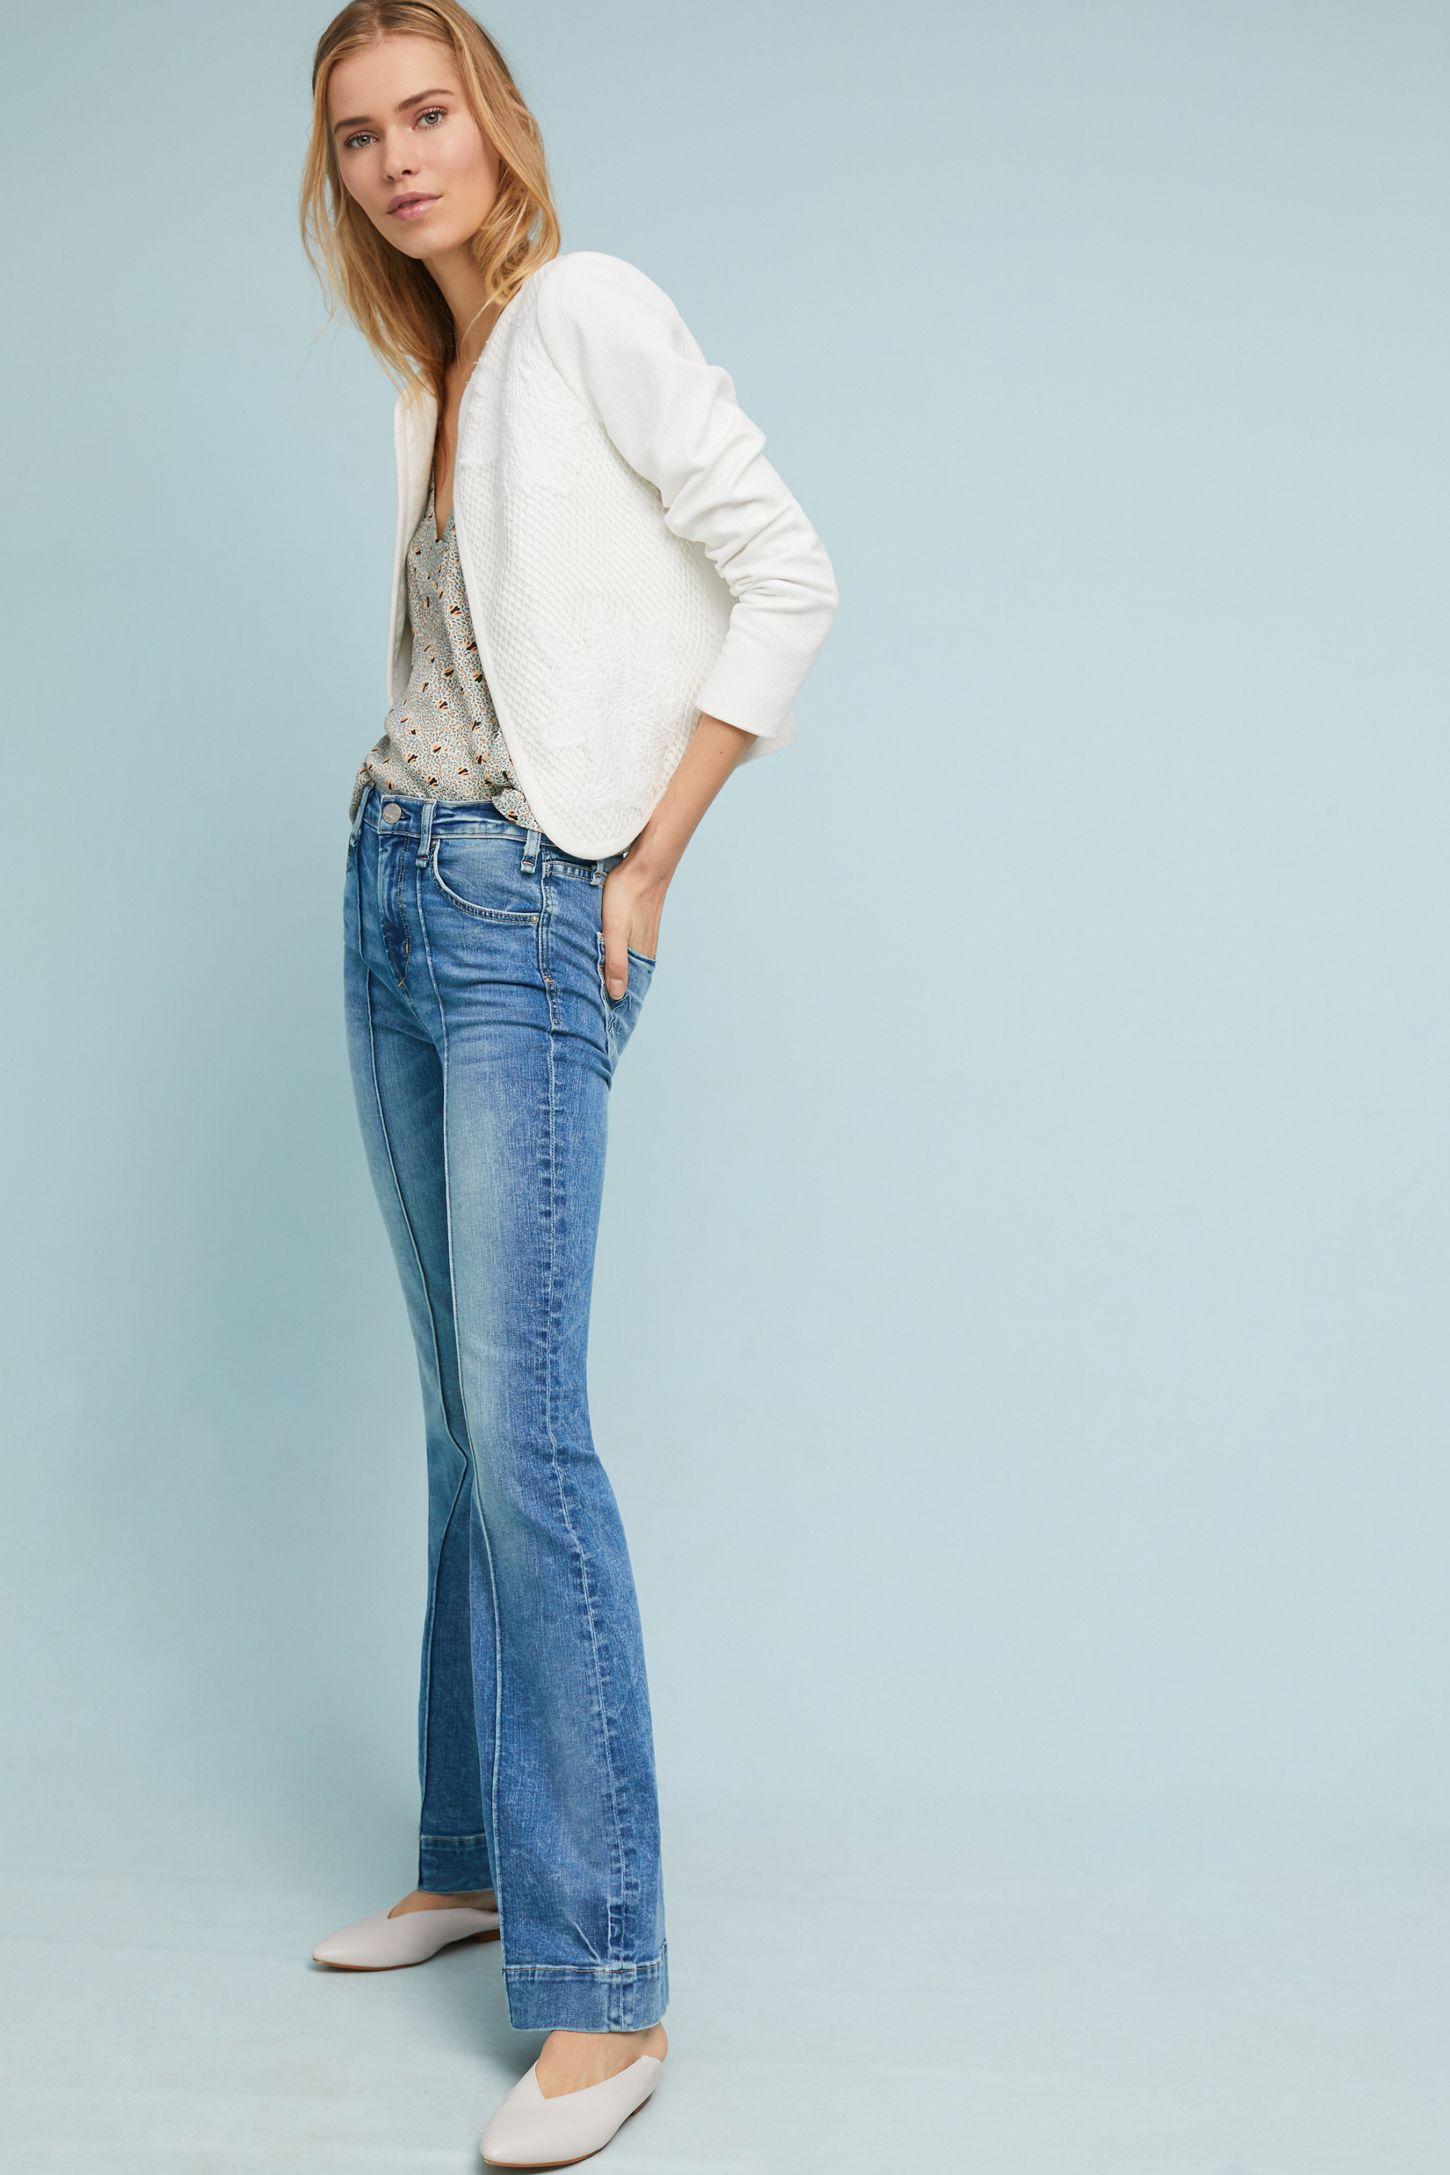 bc14a2fb9e9 McGuire Studio High-Rise Flare Jeans